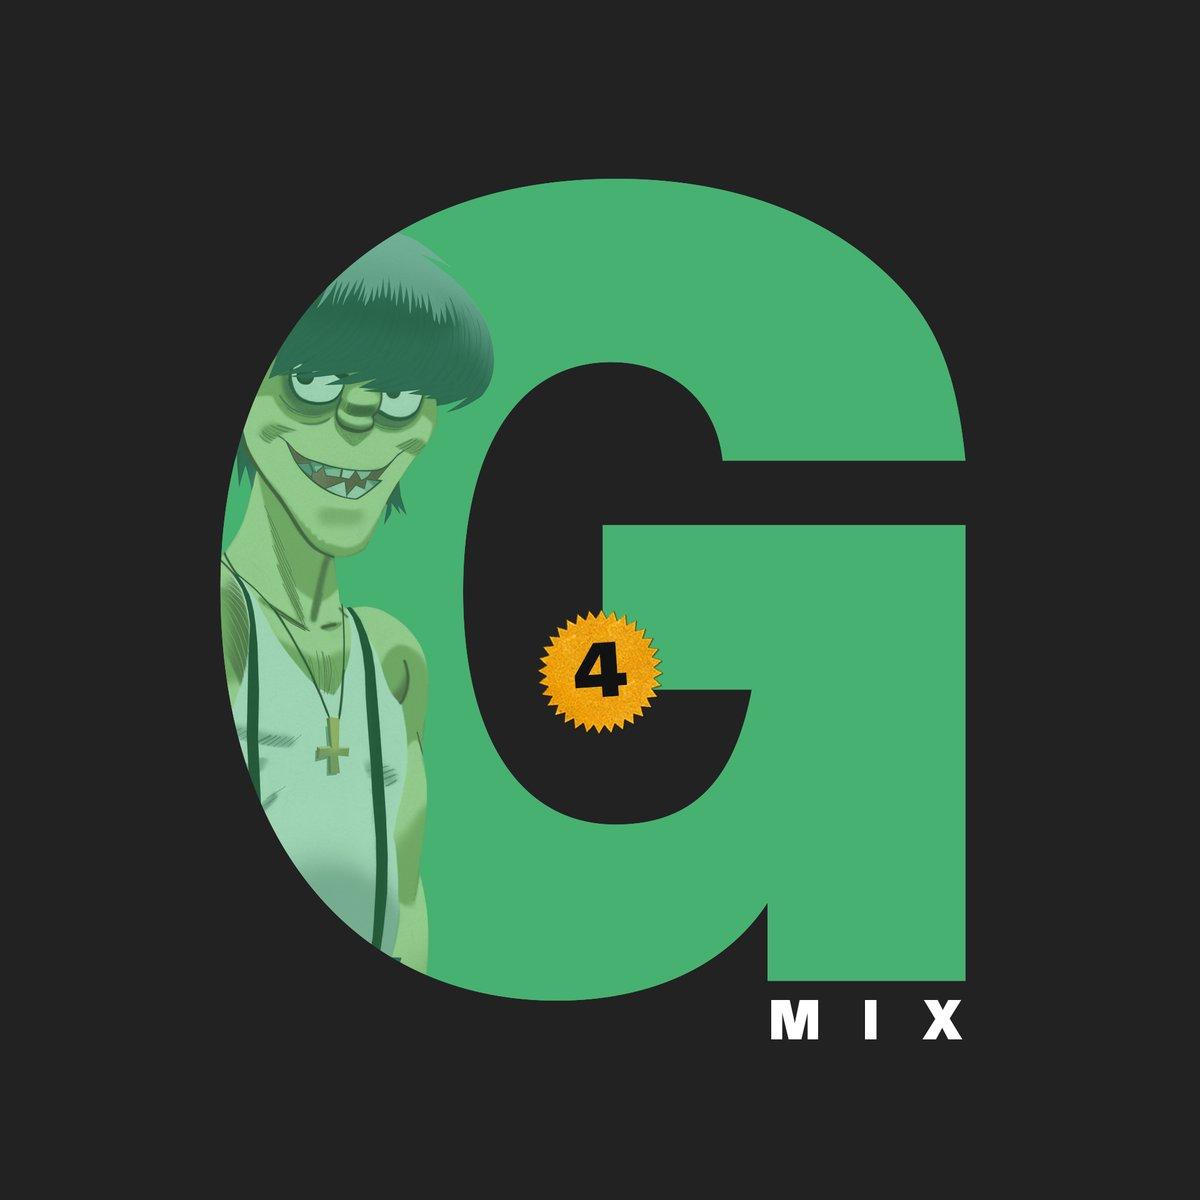 G-Mix: Murdoc 4